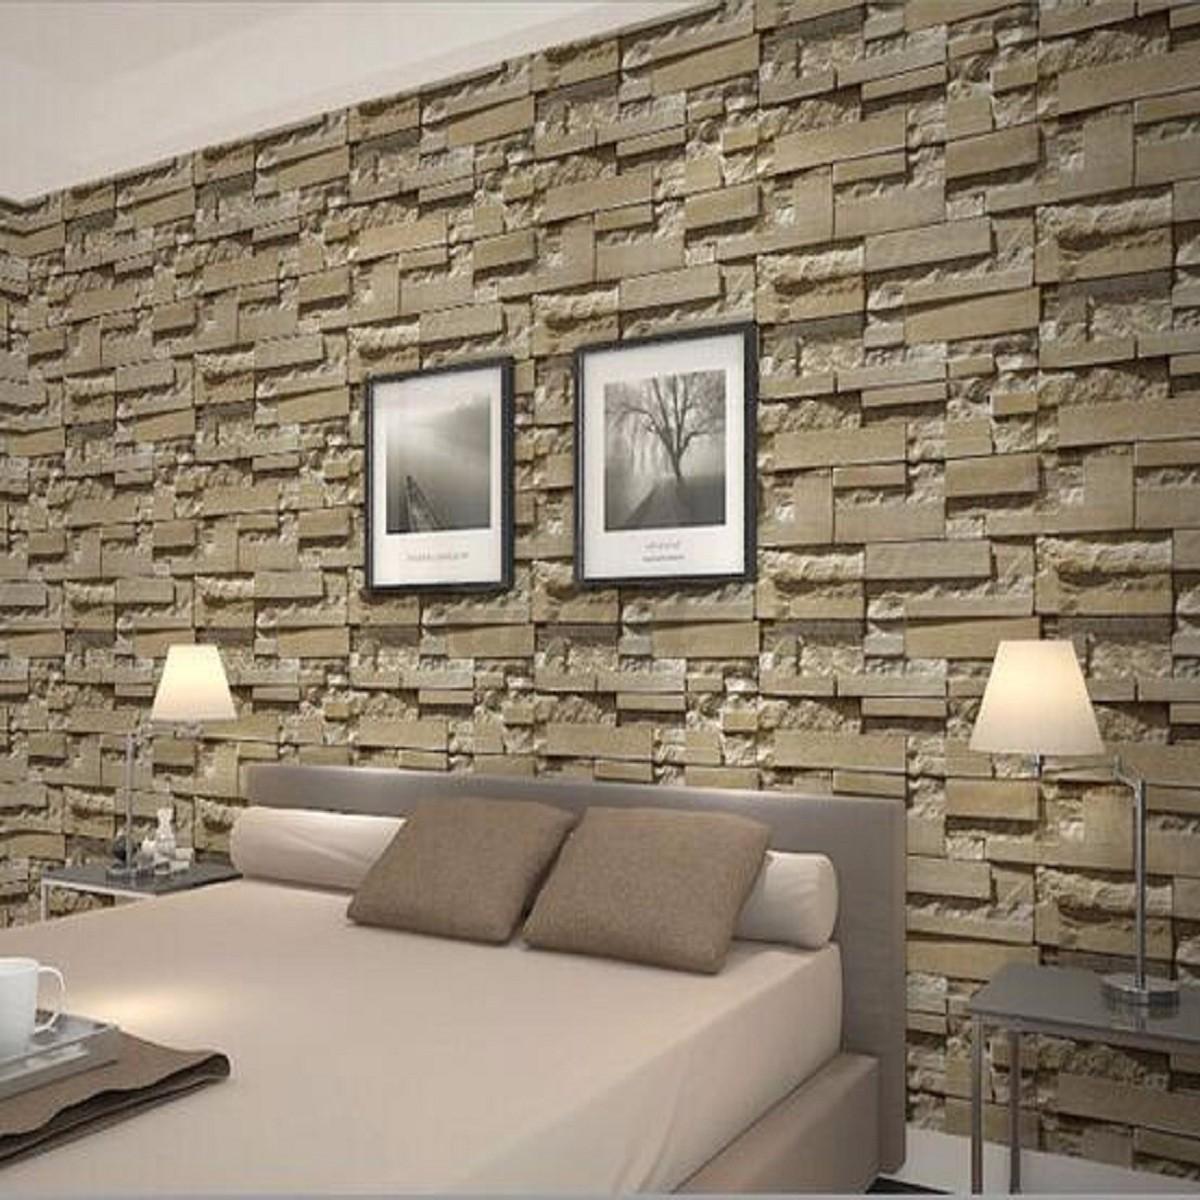 3d tapete stein steintapete vliestapete optik beige 10x0. Black Bedroom Furniture Sets. Home Design Ideas